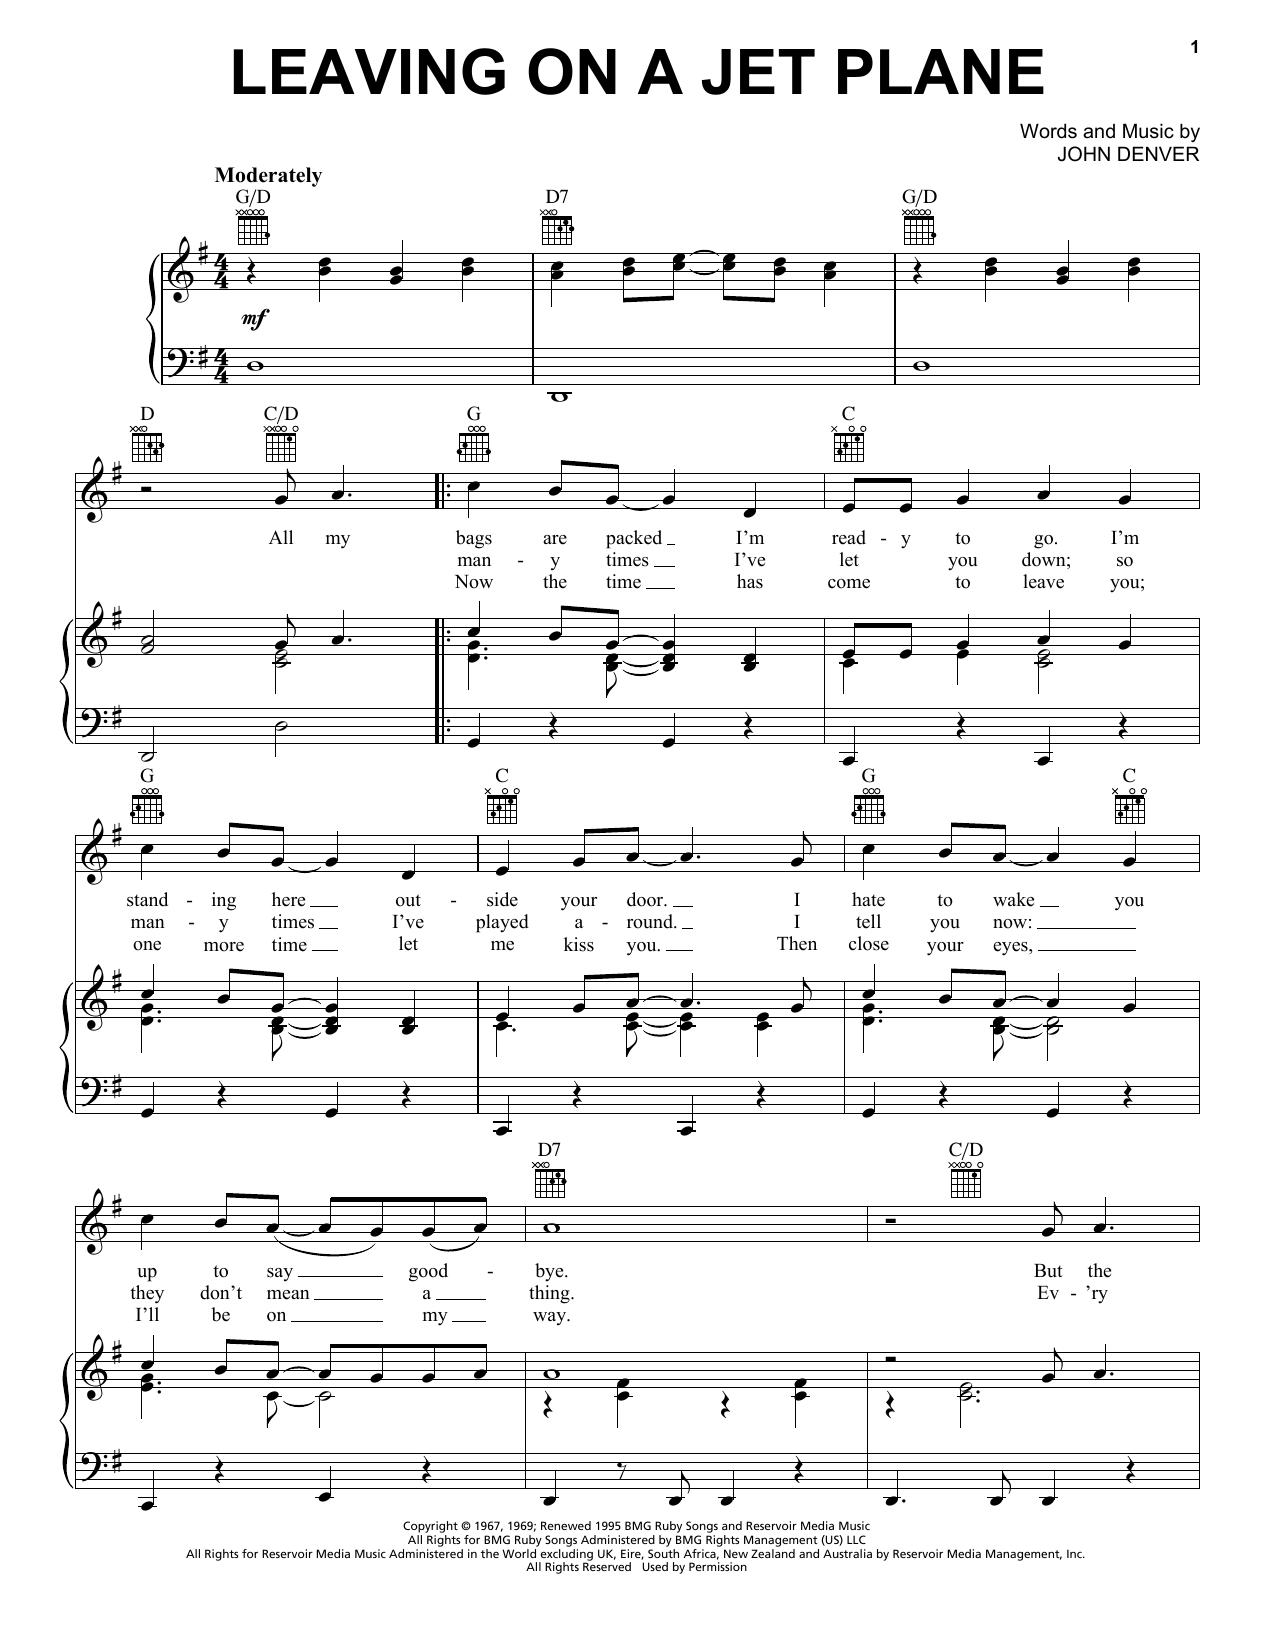 John Denver Leaving On A Jet Plane sheet music notes and chords